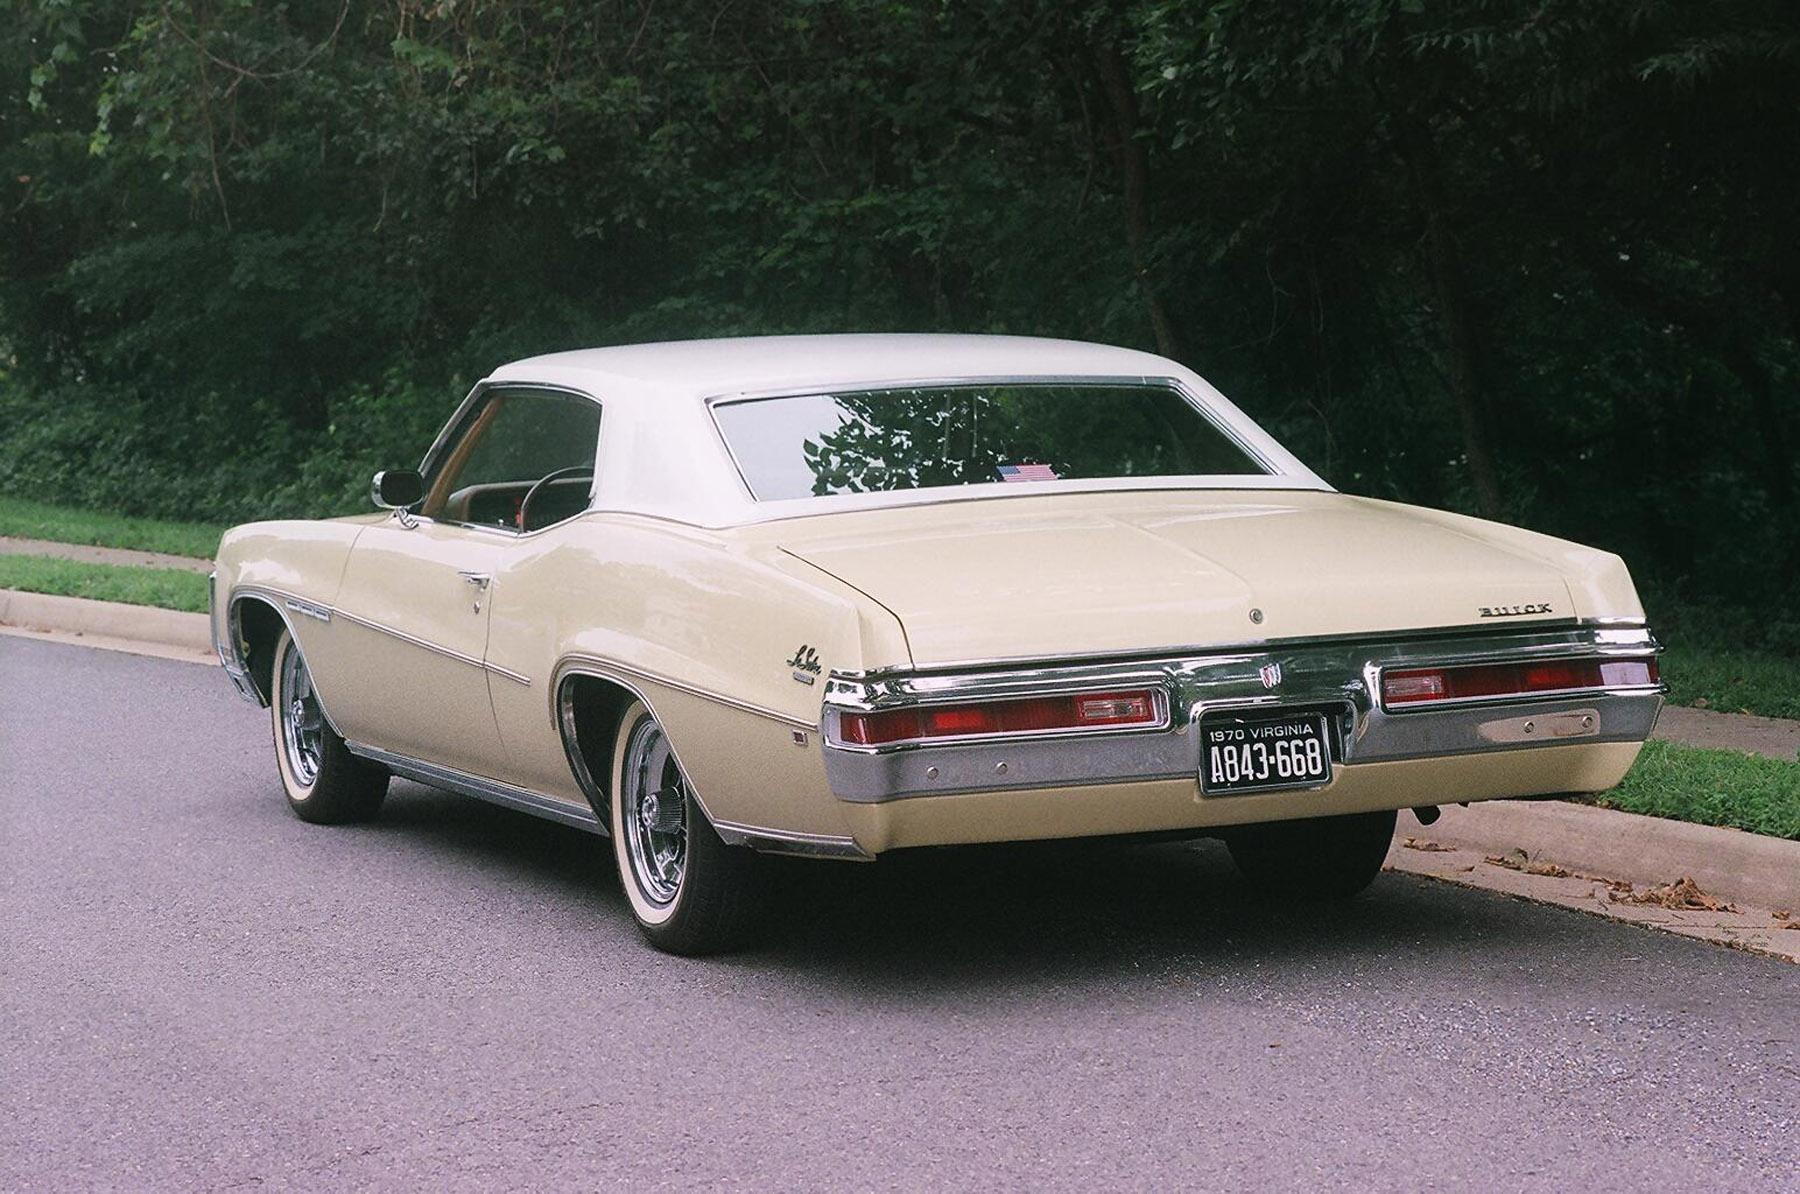 Buick Roanoke >> 1970 Buick LeSabre Custom Purchased in Pristine Condition - Classic Classics - - GrooveCar